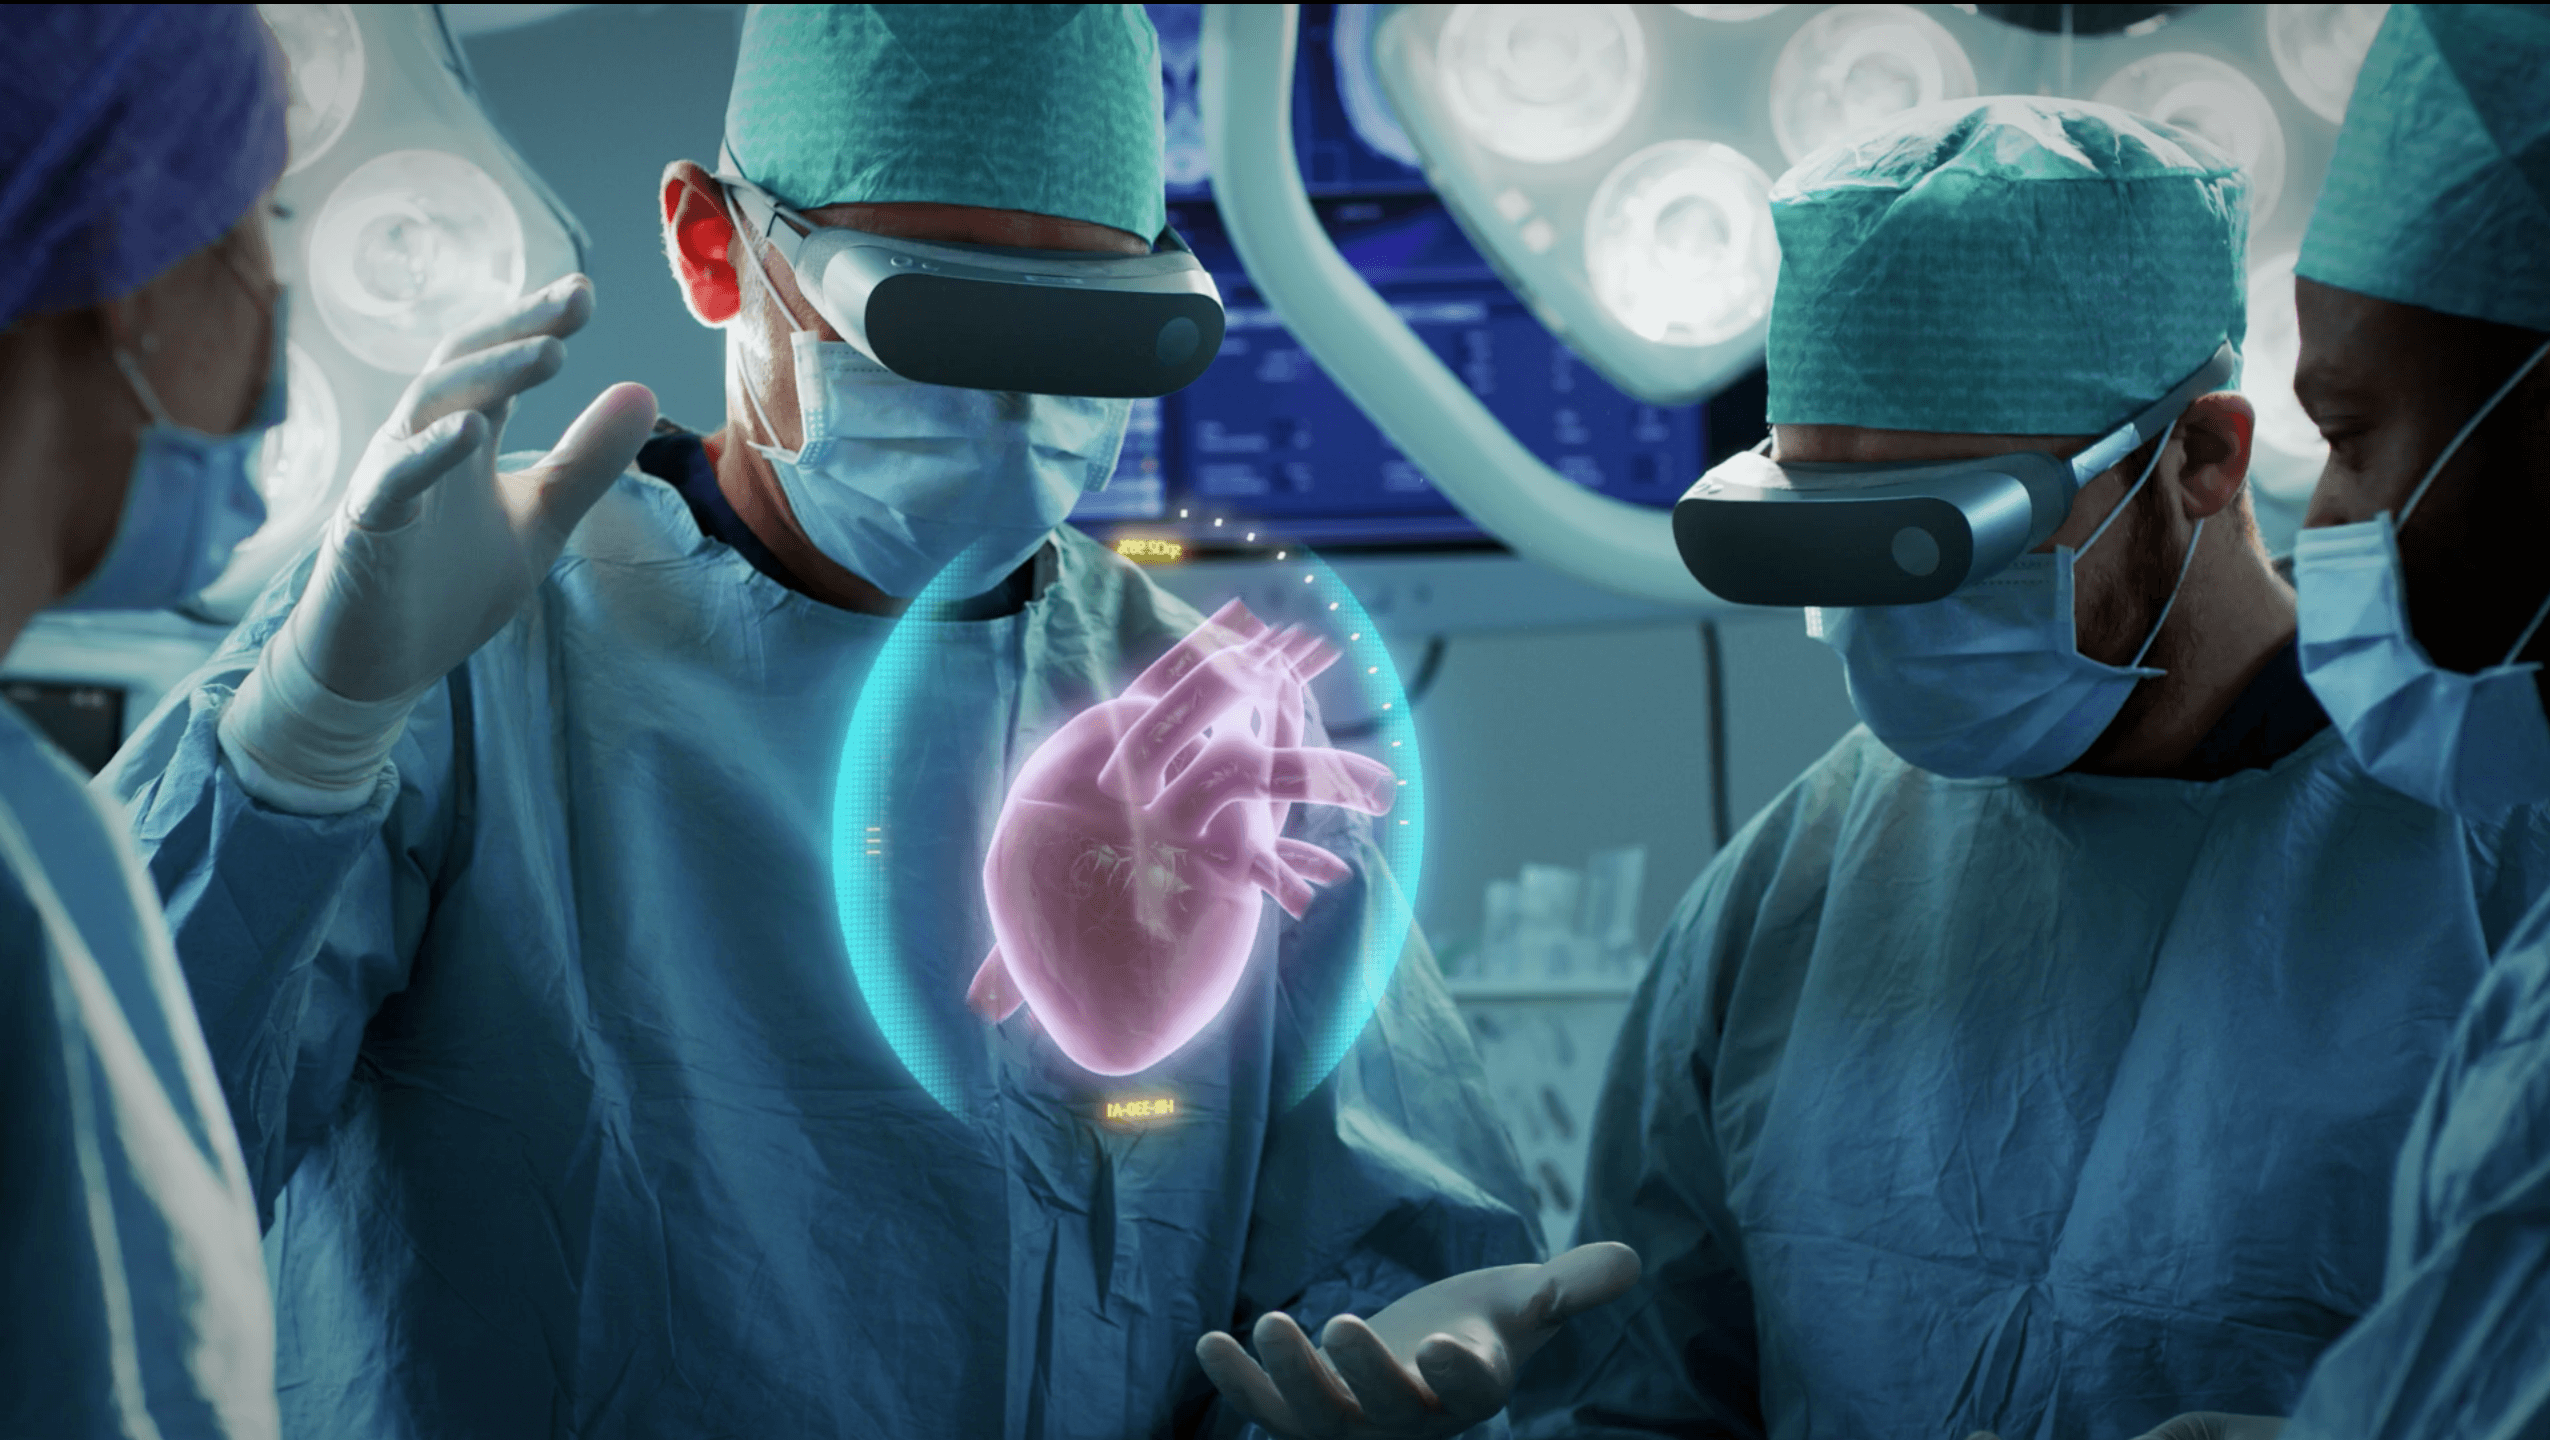 VR & AR for Healthcare & Medicine | vStream Digital Media